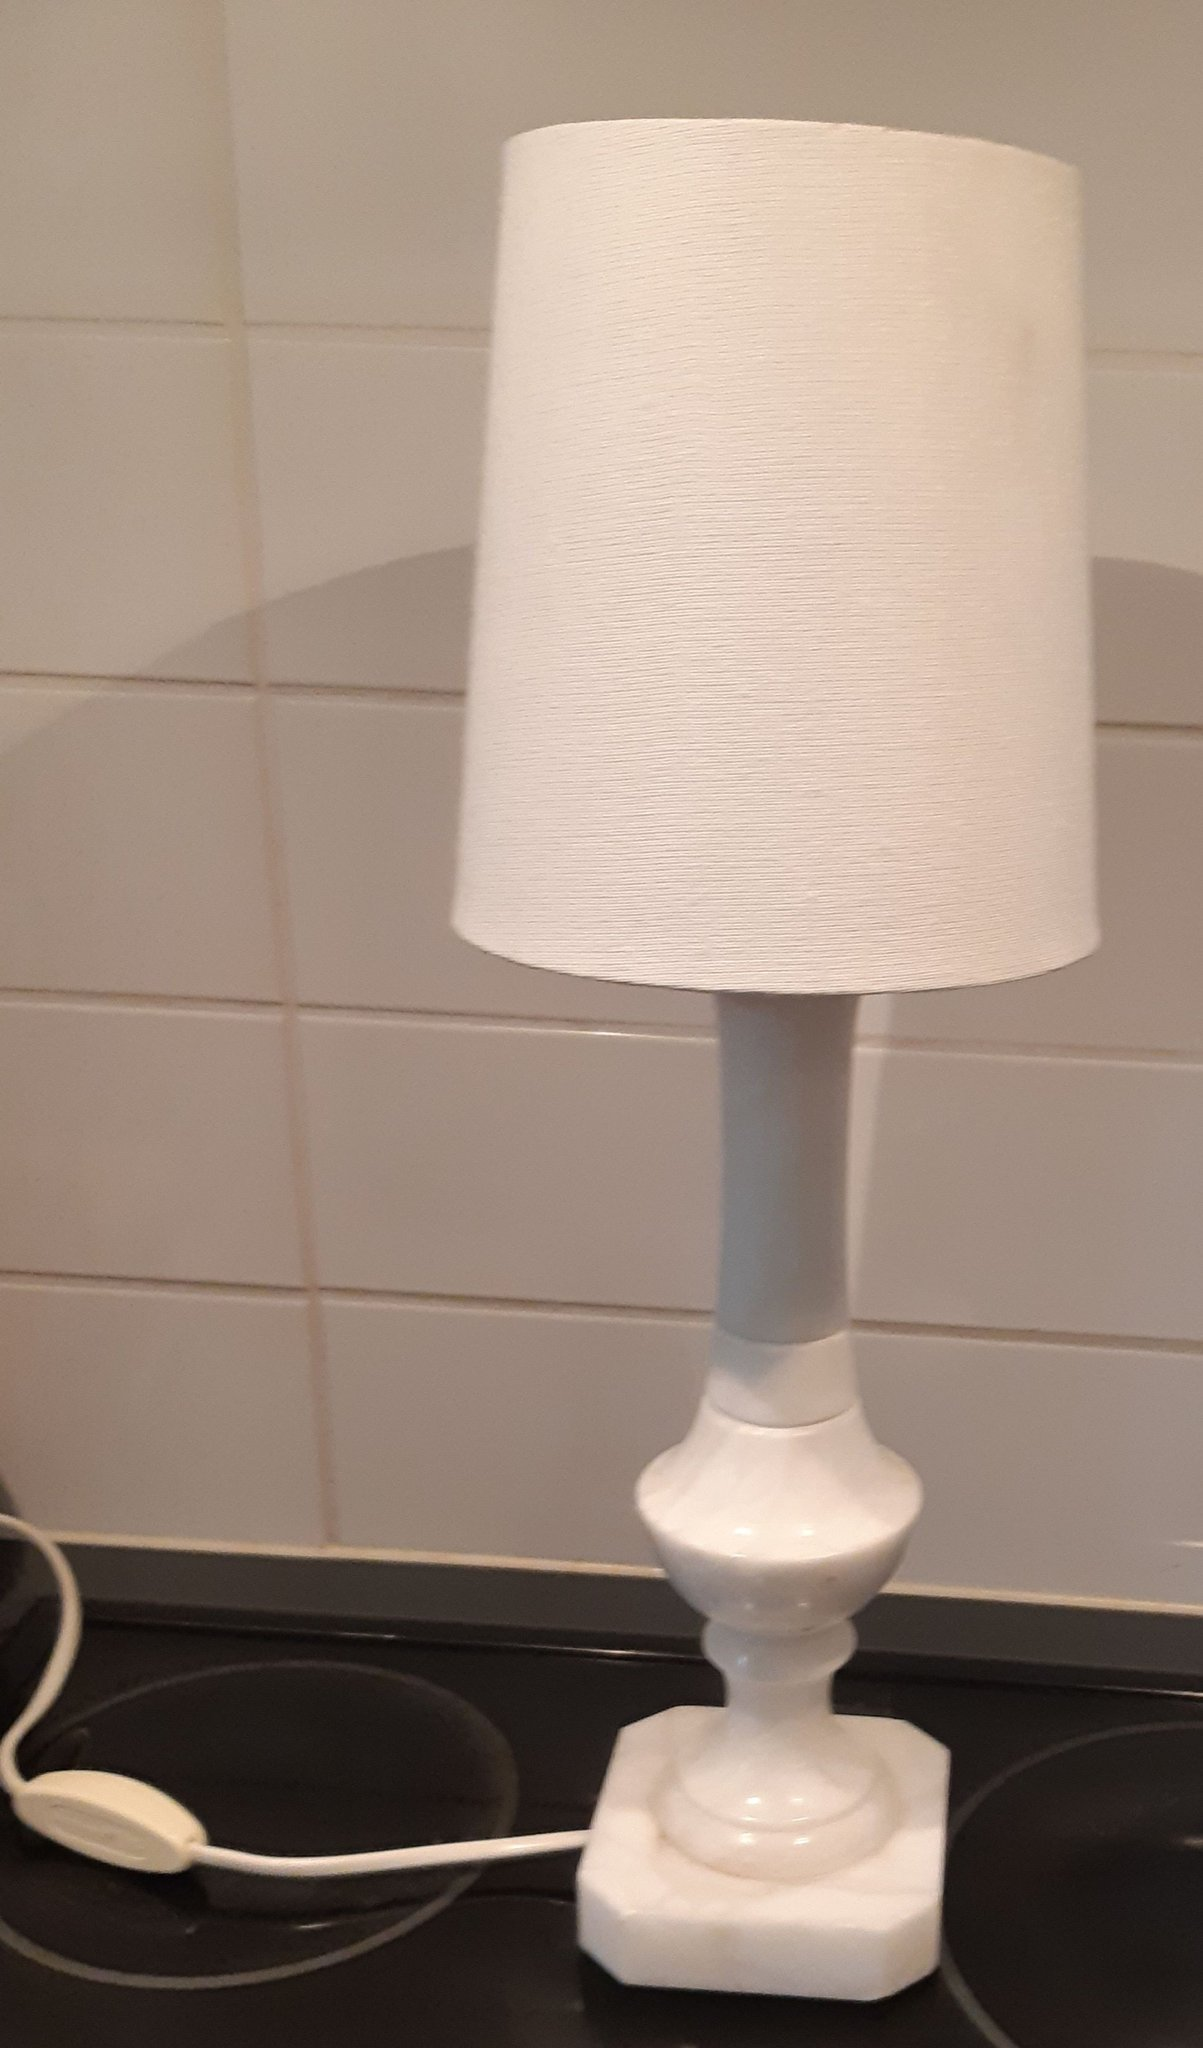 BORDSLAMPA 1900 tal Vit Alabaster Lampskärm Fint fungerande skick 45x16 cm